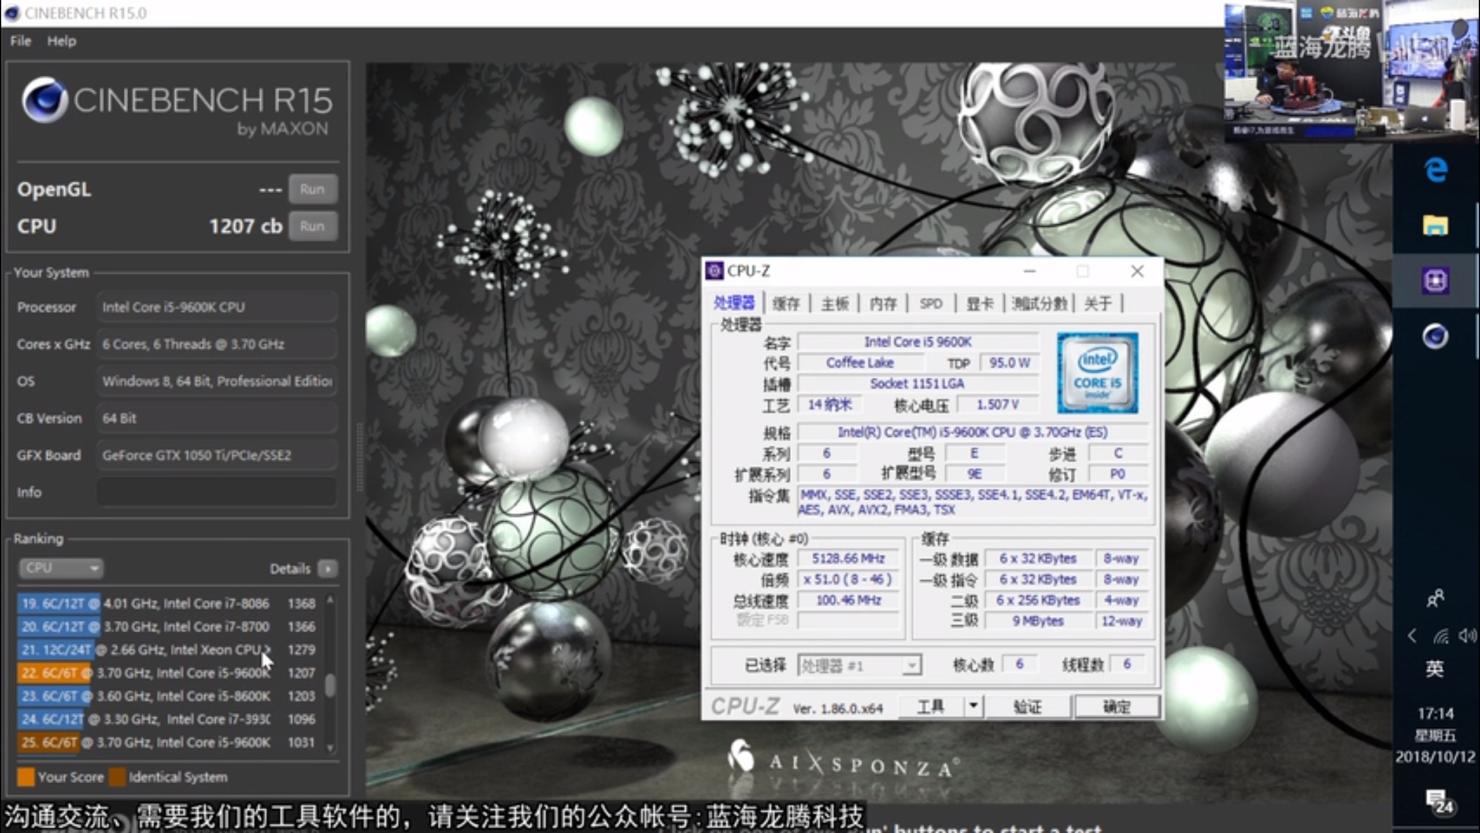 intel-core-i5-9600k-cpu-benchmarks_oc_1